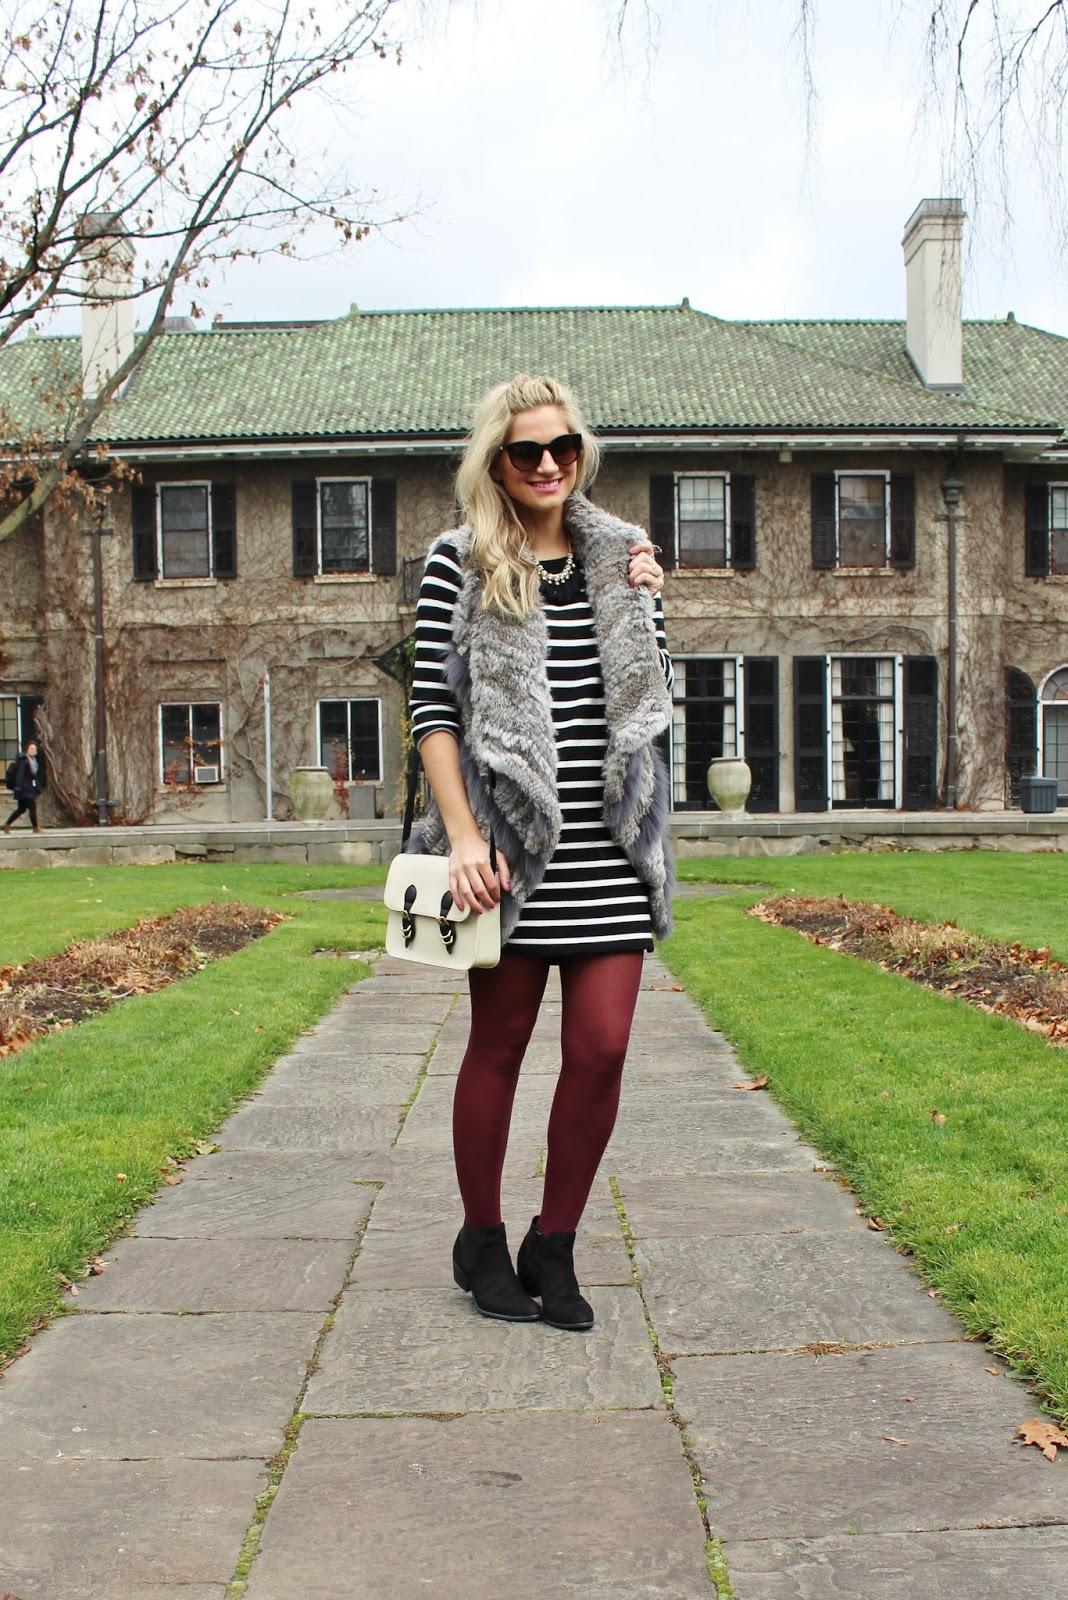 bijuleni- Wilsons Leather rabbit fur vest and striped dress